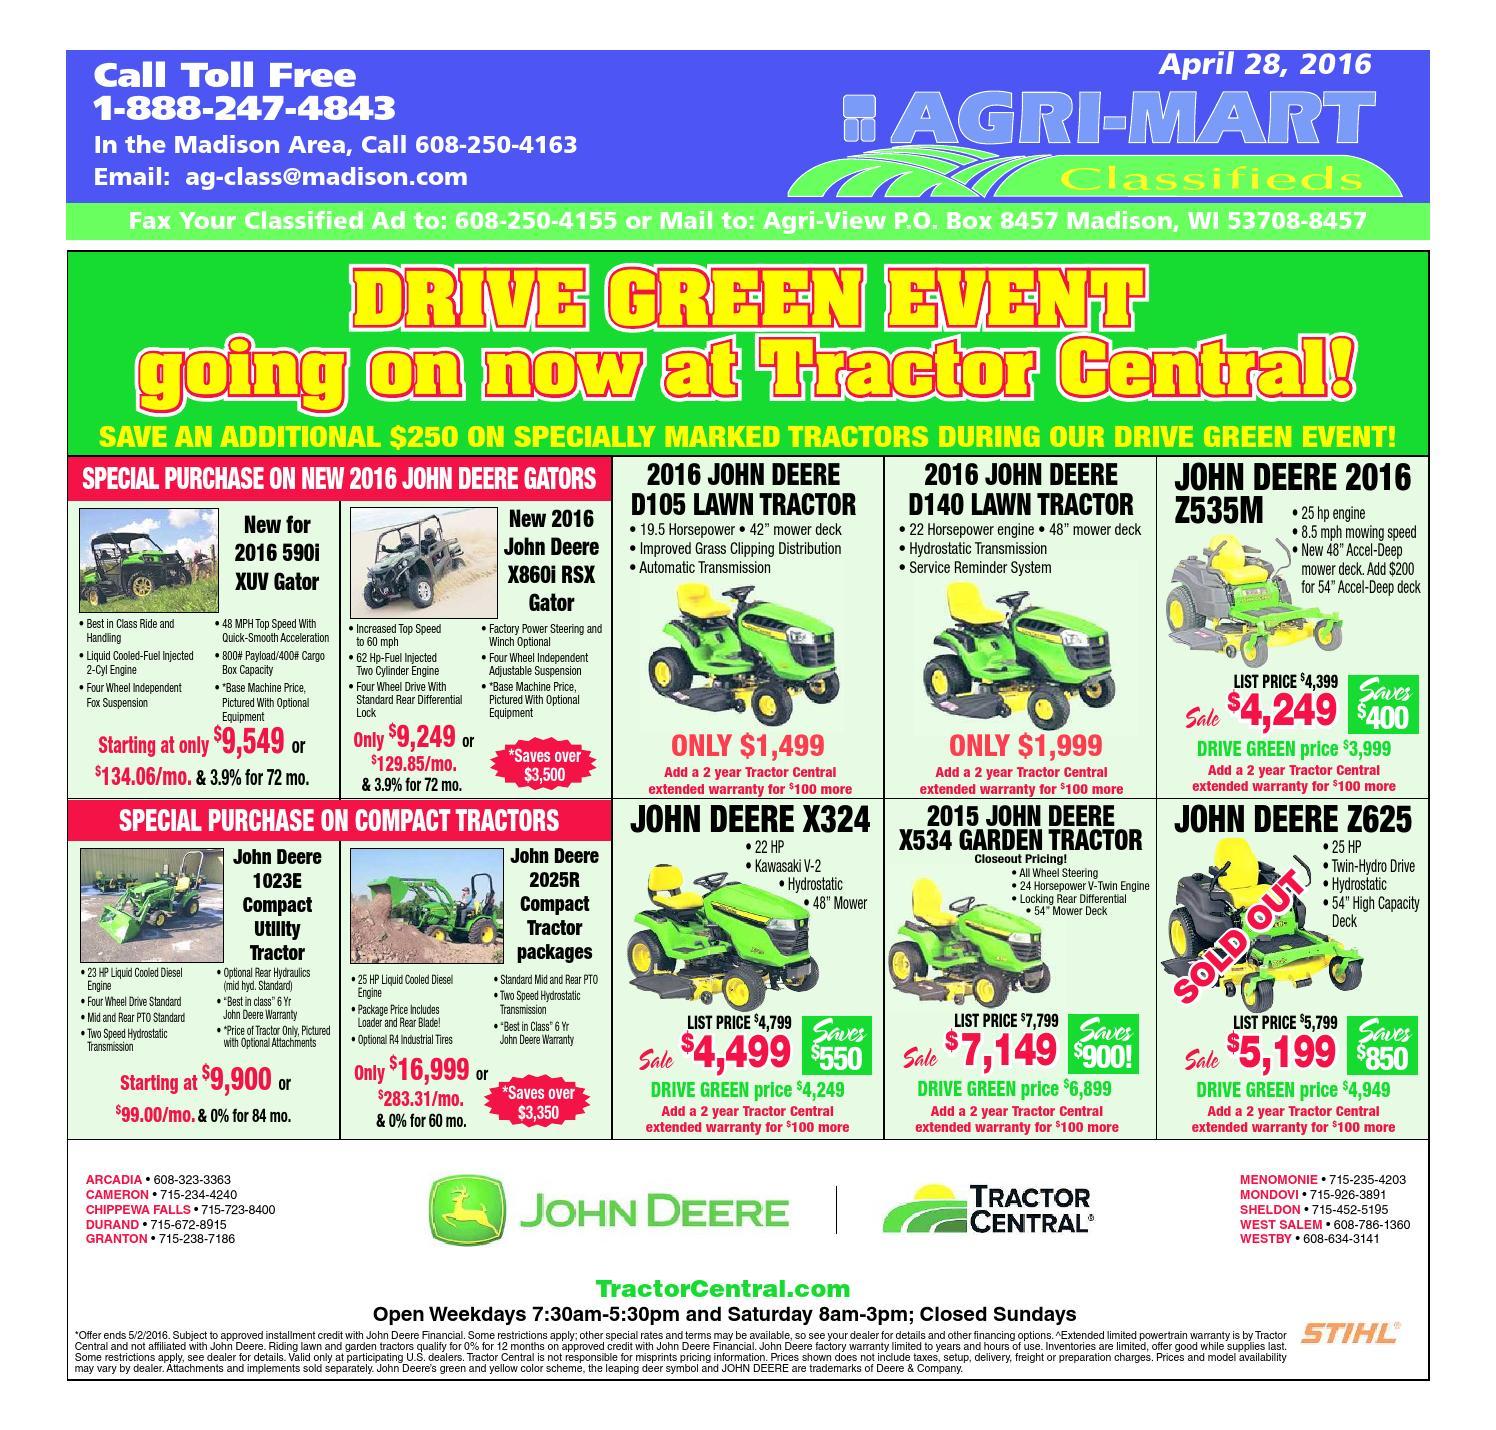 April 28 2016 Agri-Mart by Madison com - issuu